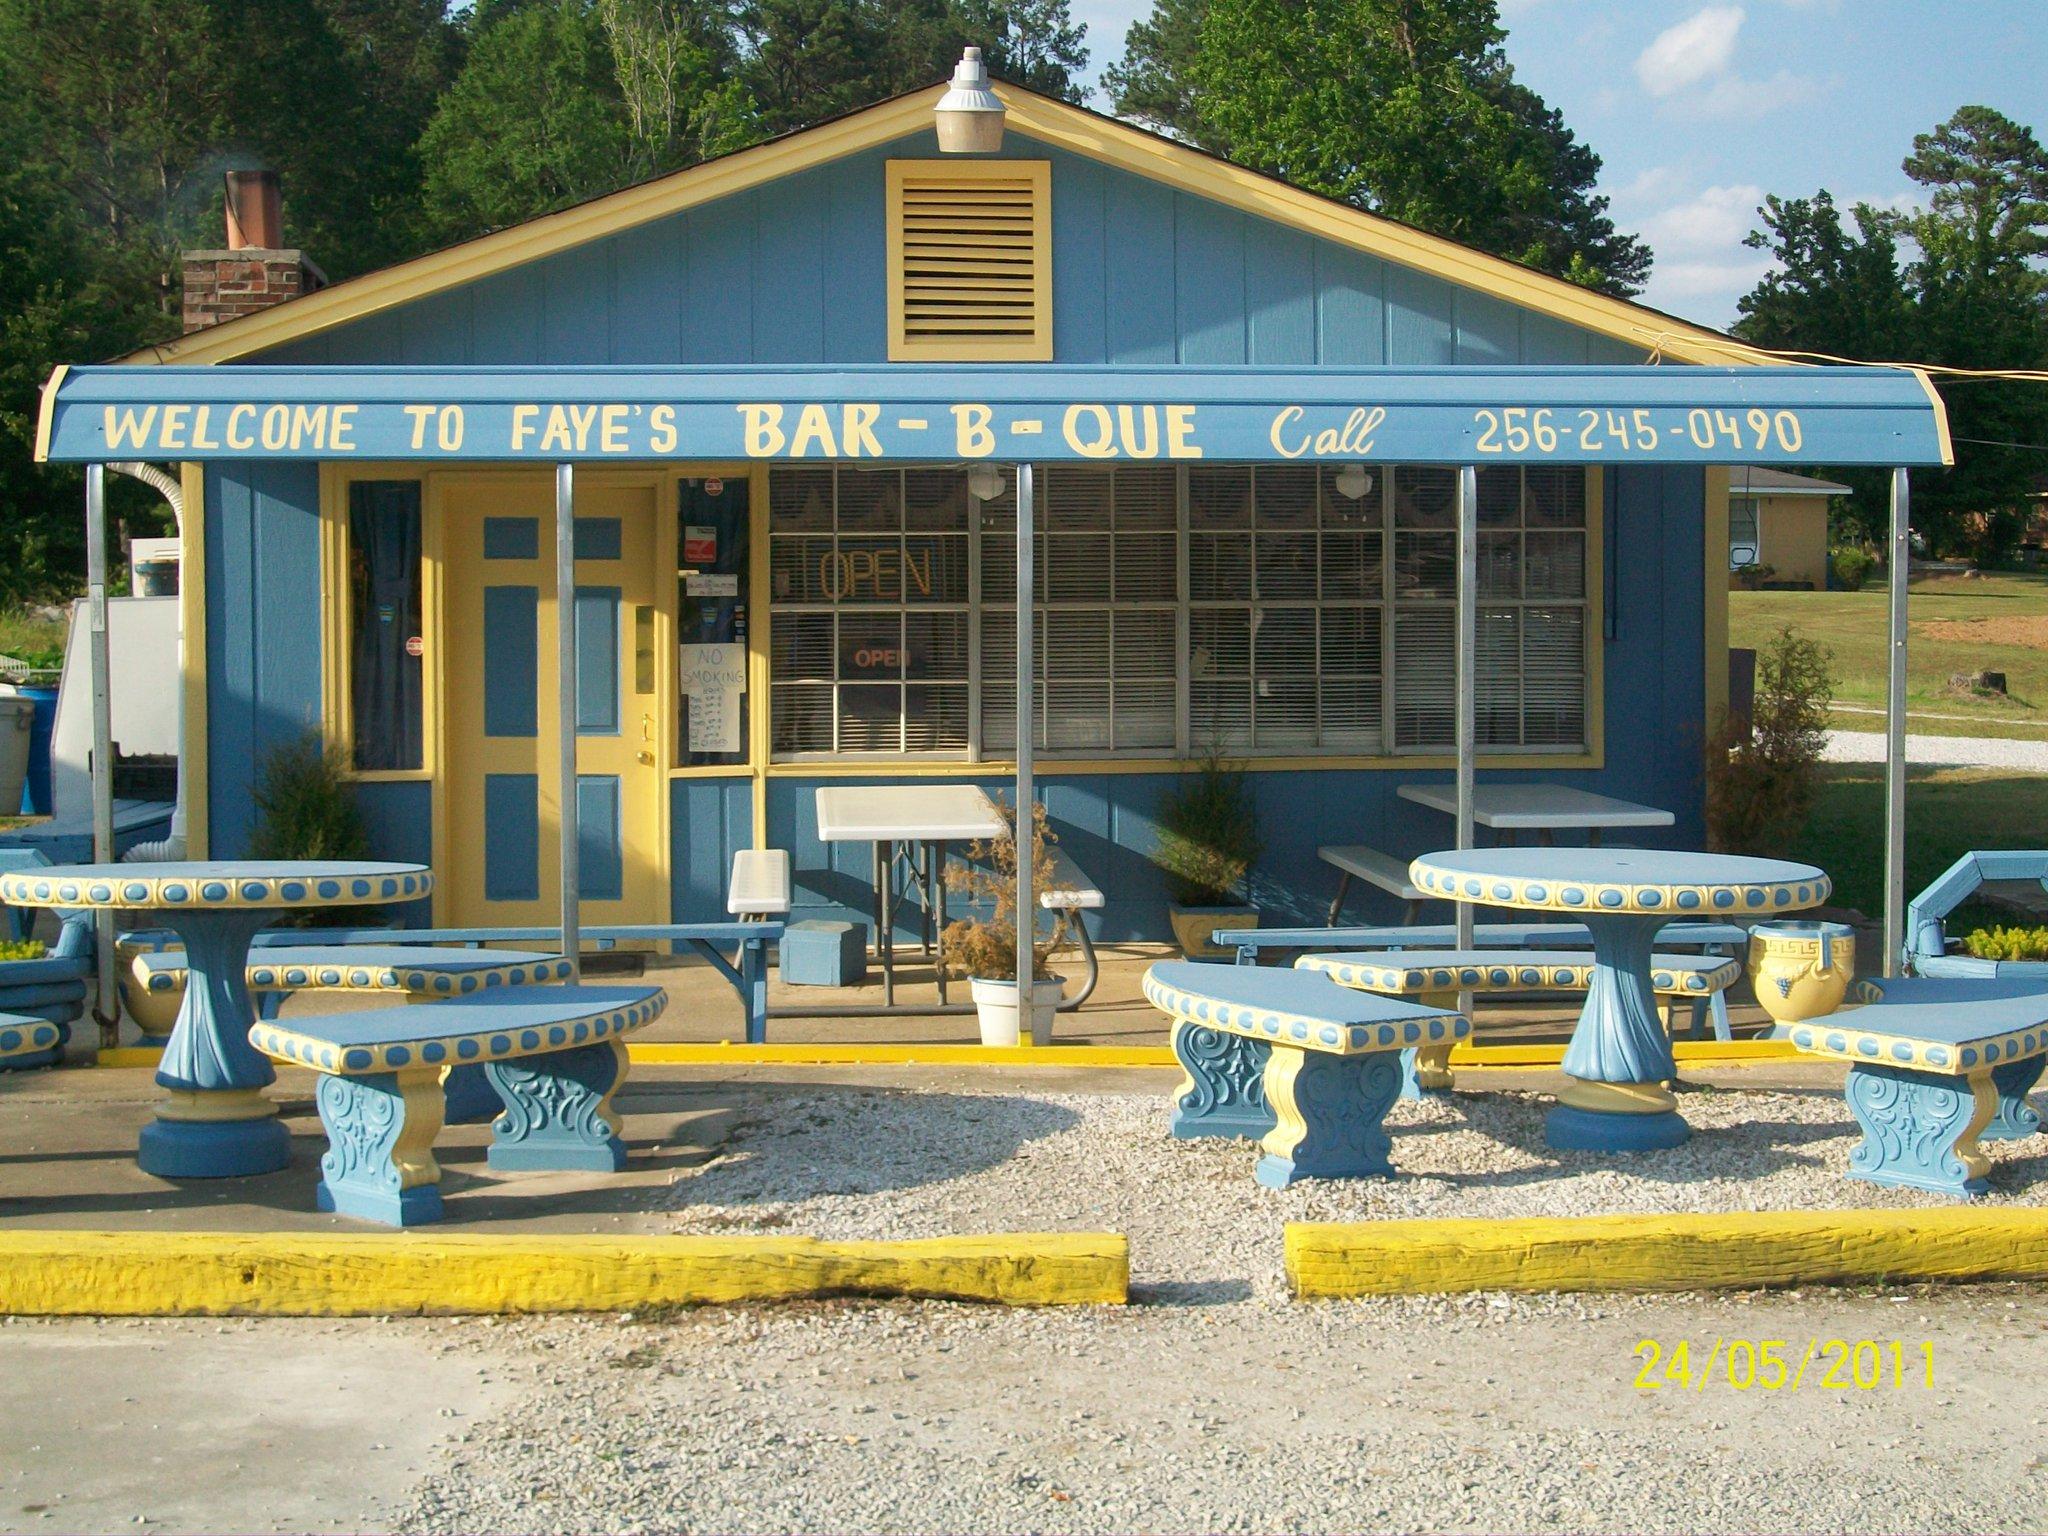 Faye's Bar-B-Que